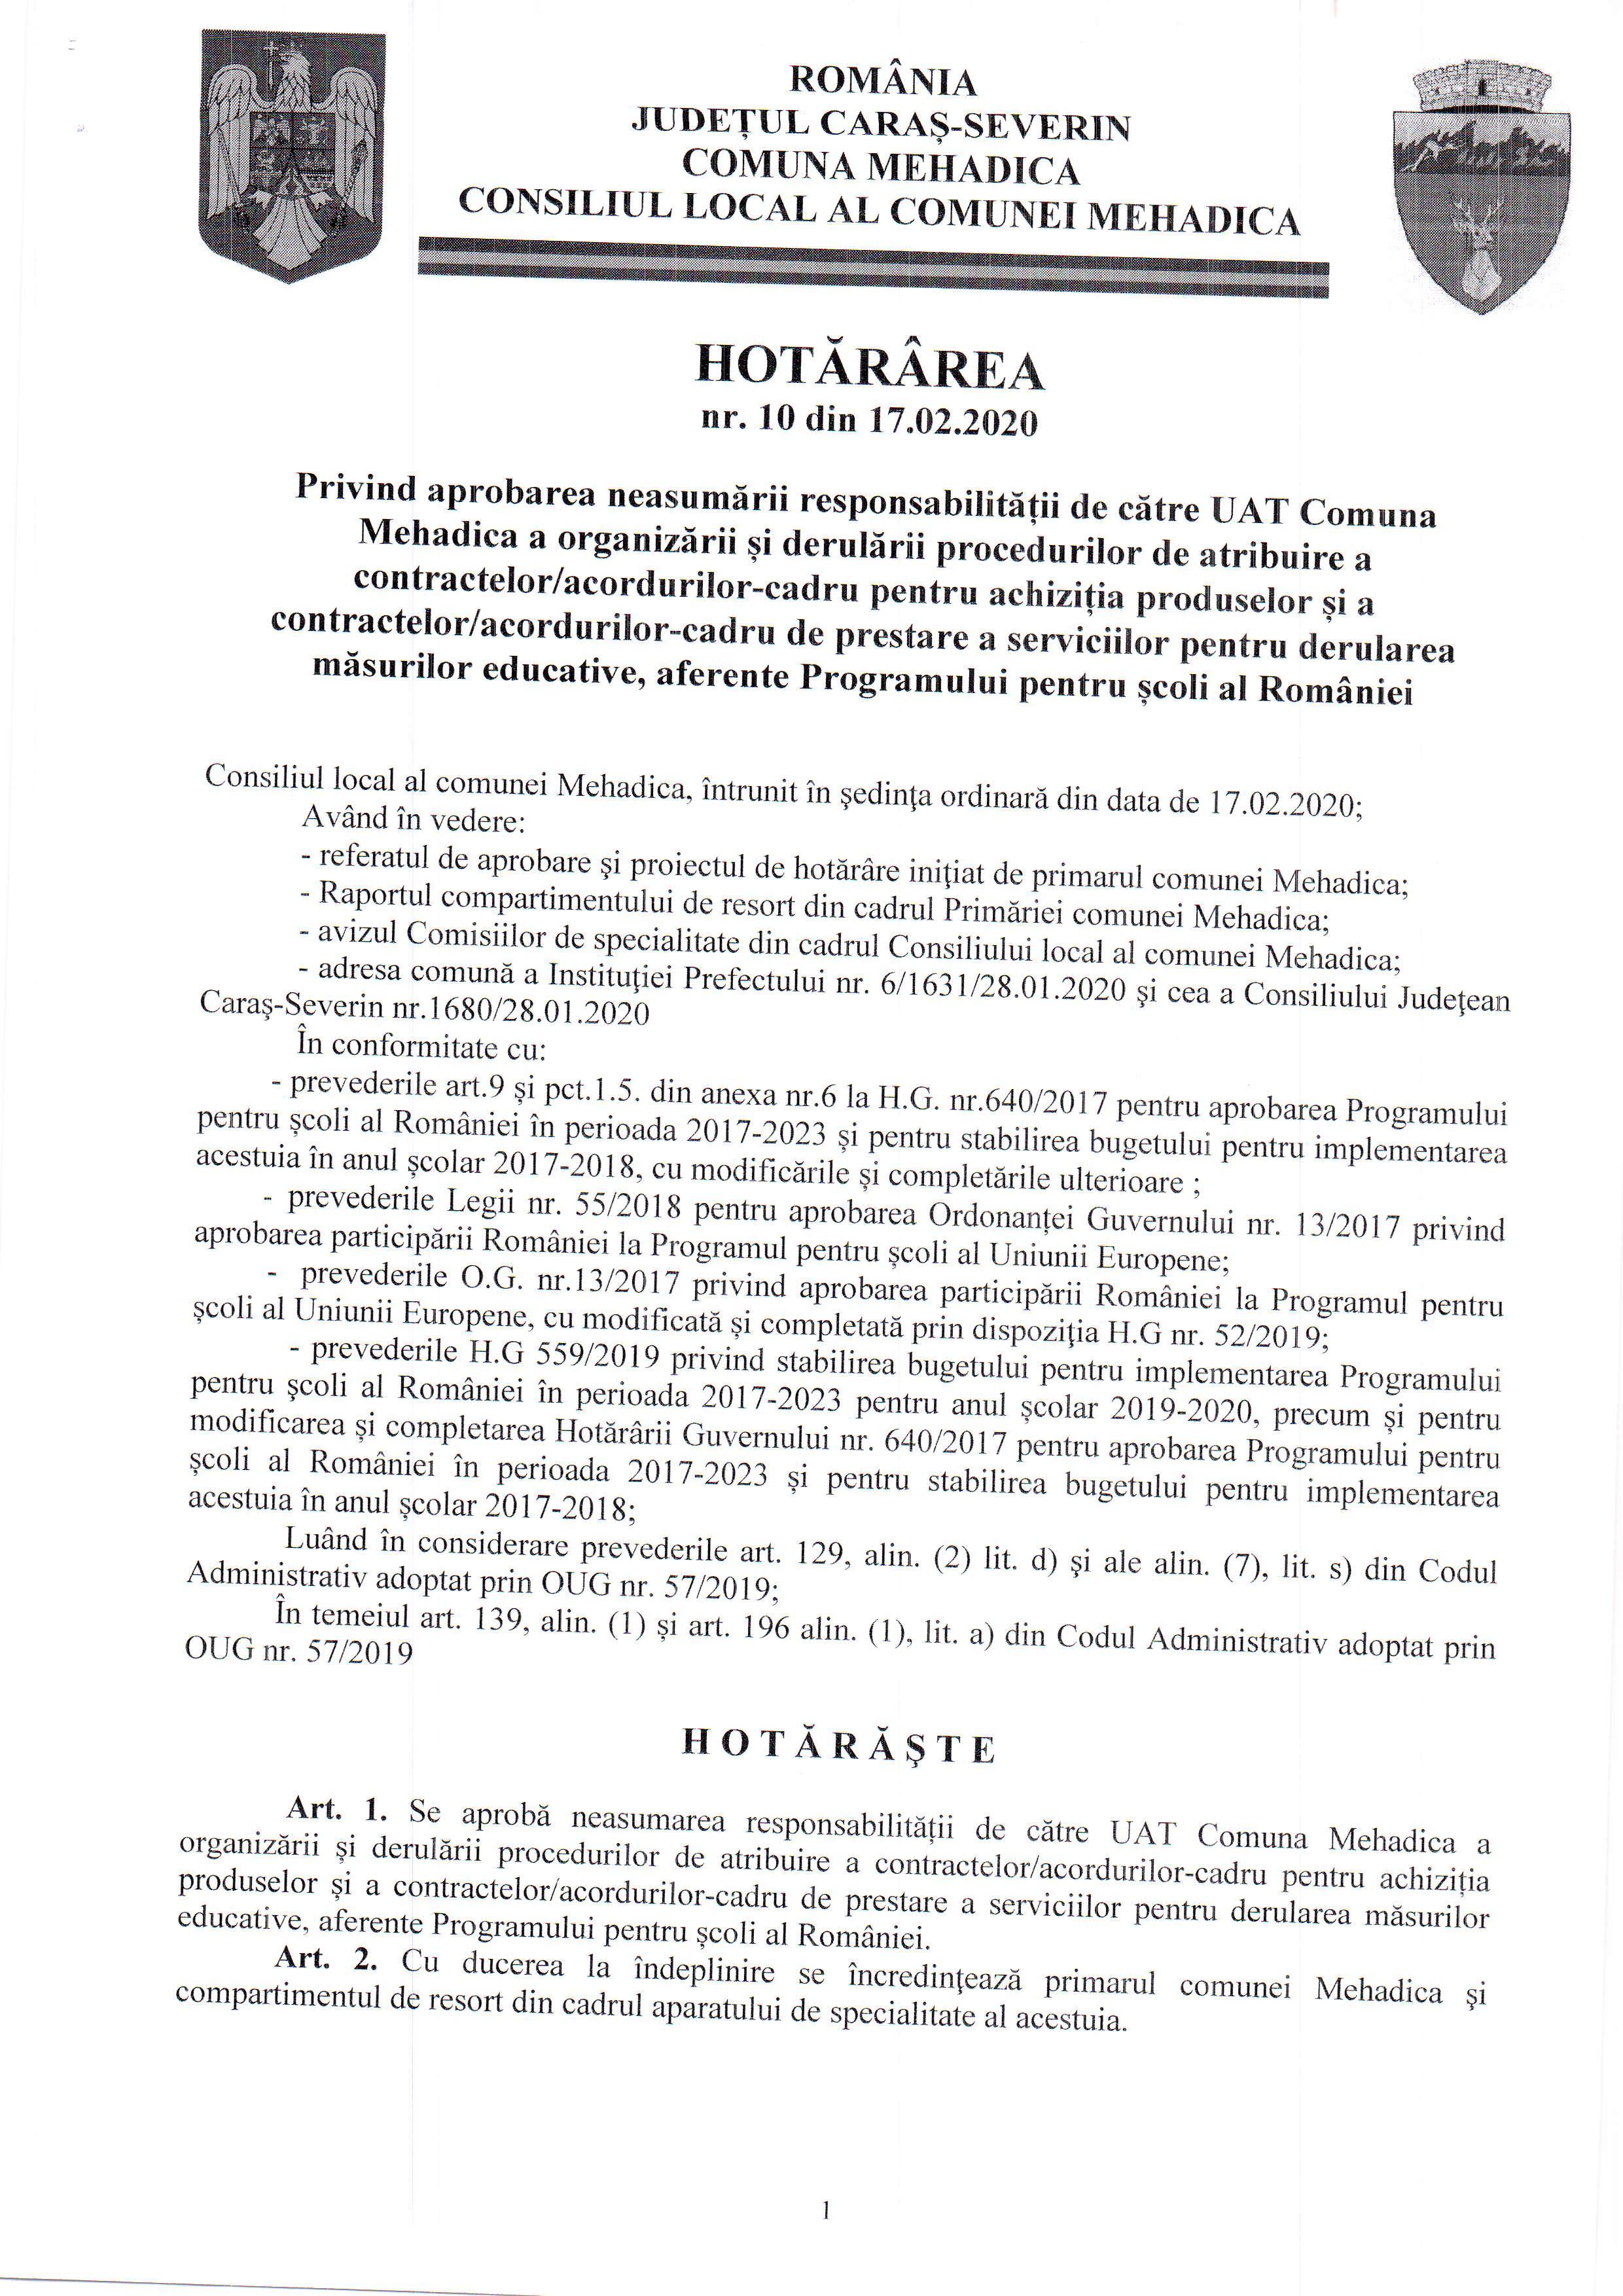 File0005_1